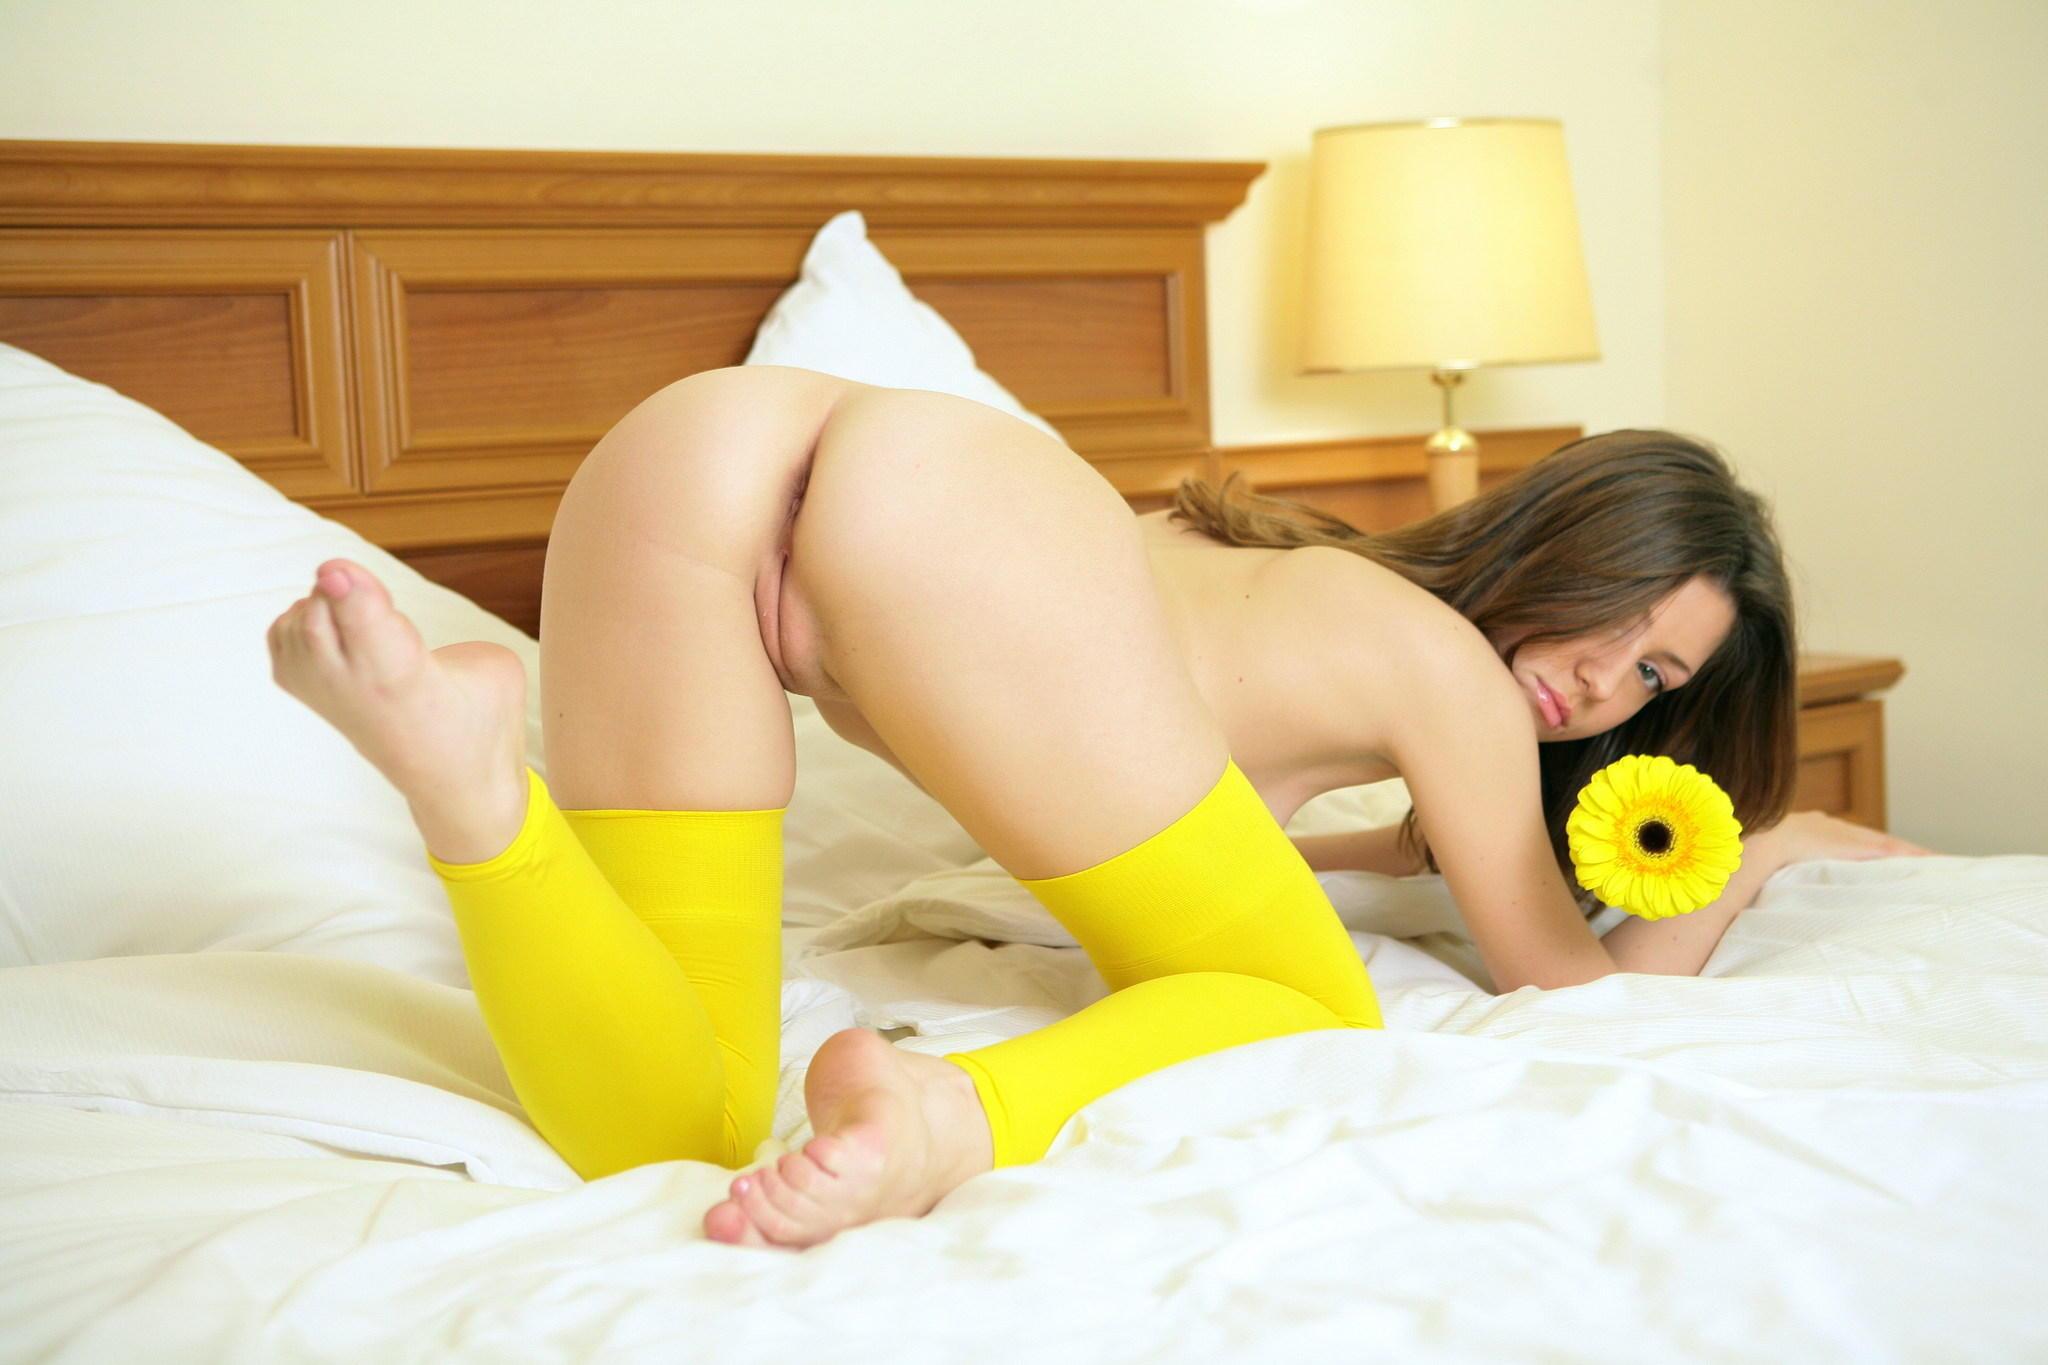 Curvy Girls Pinterest